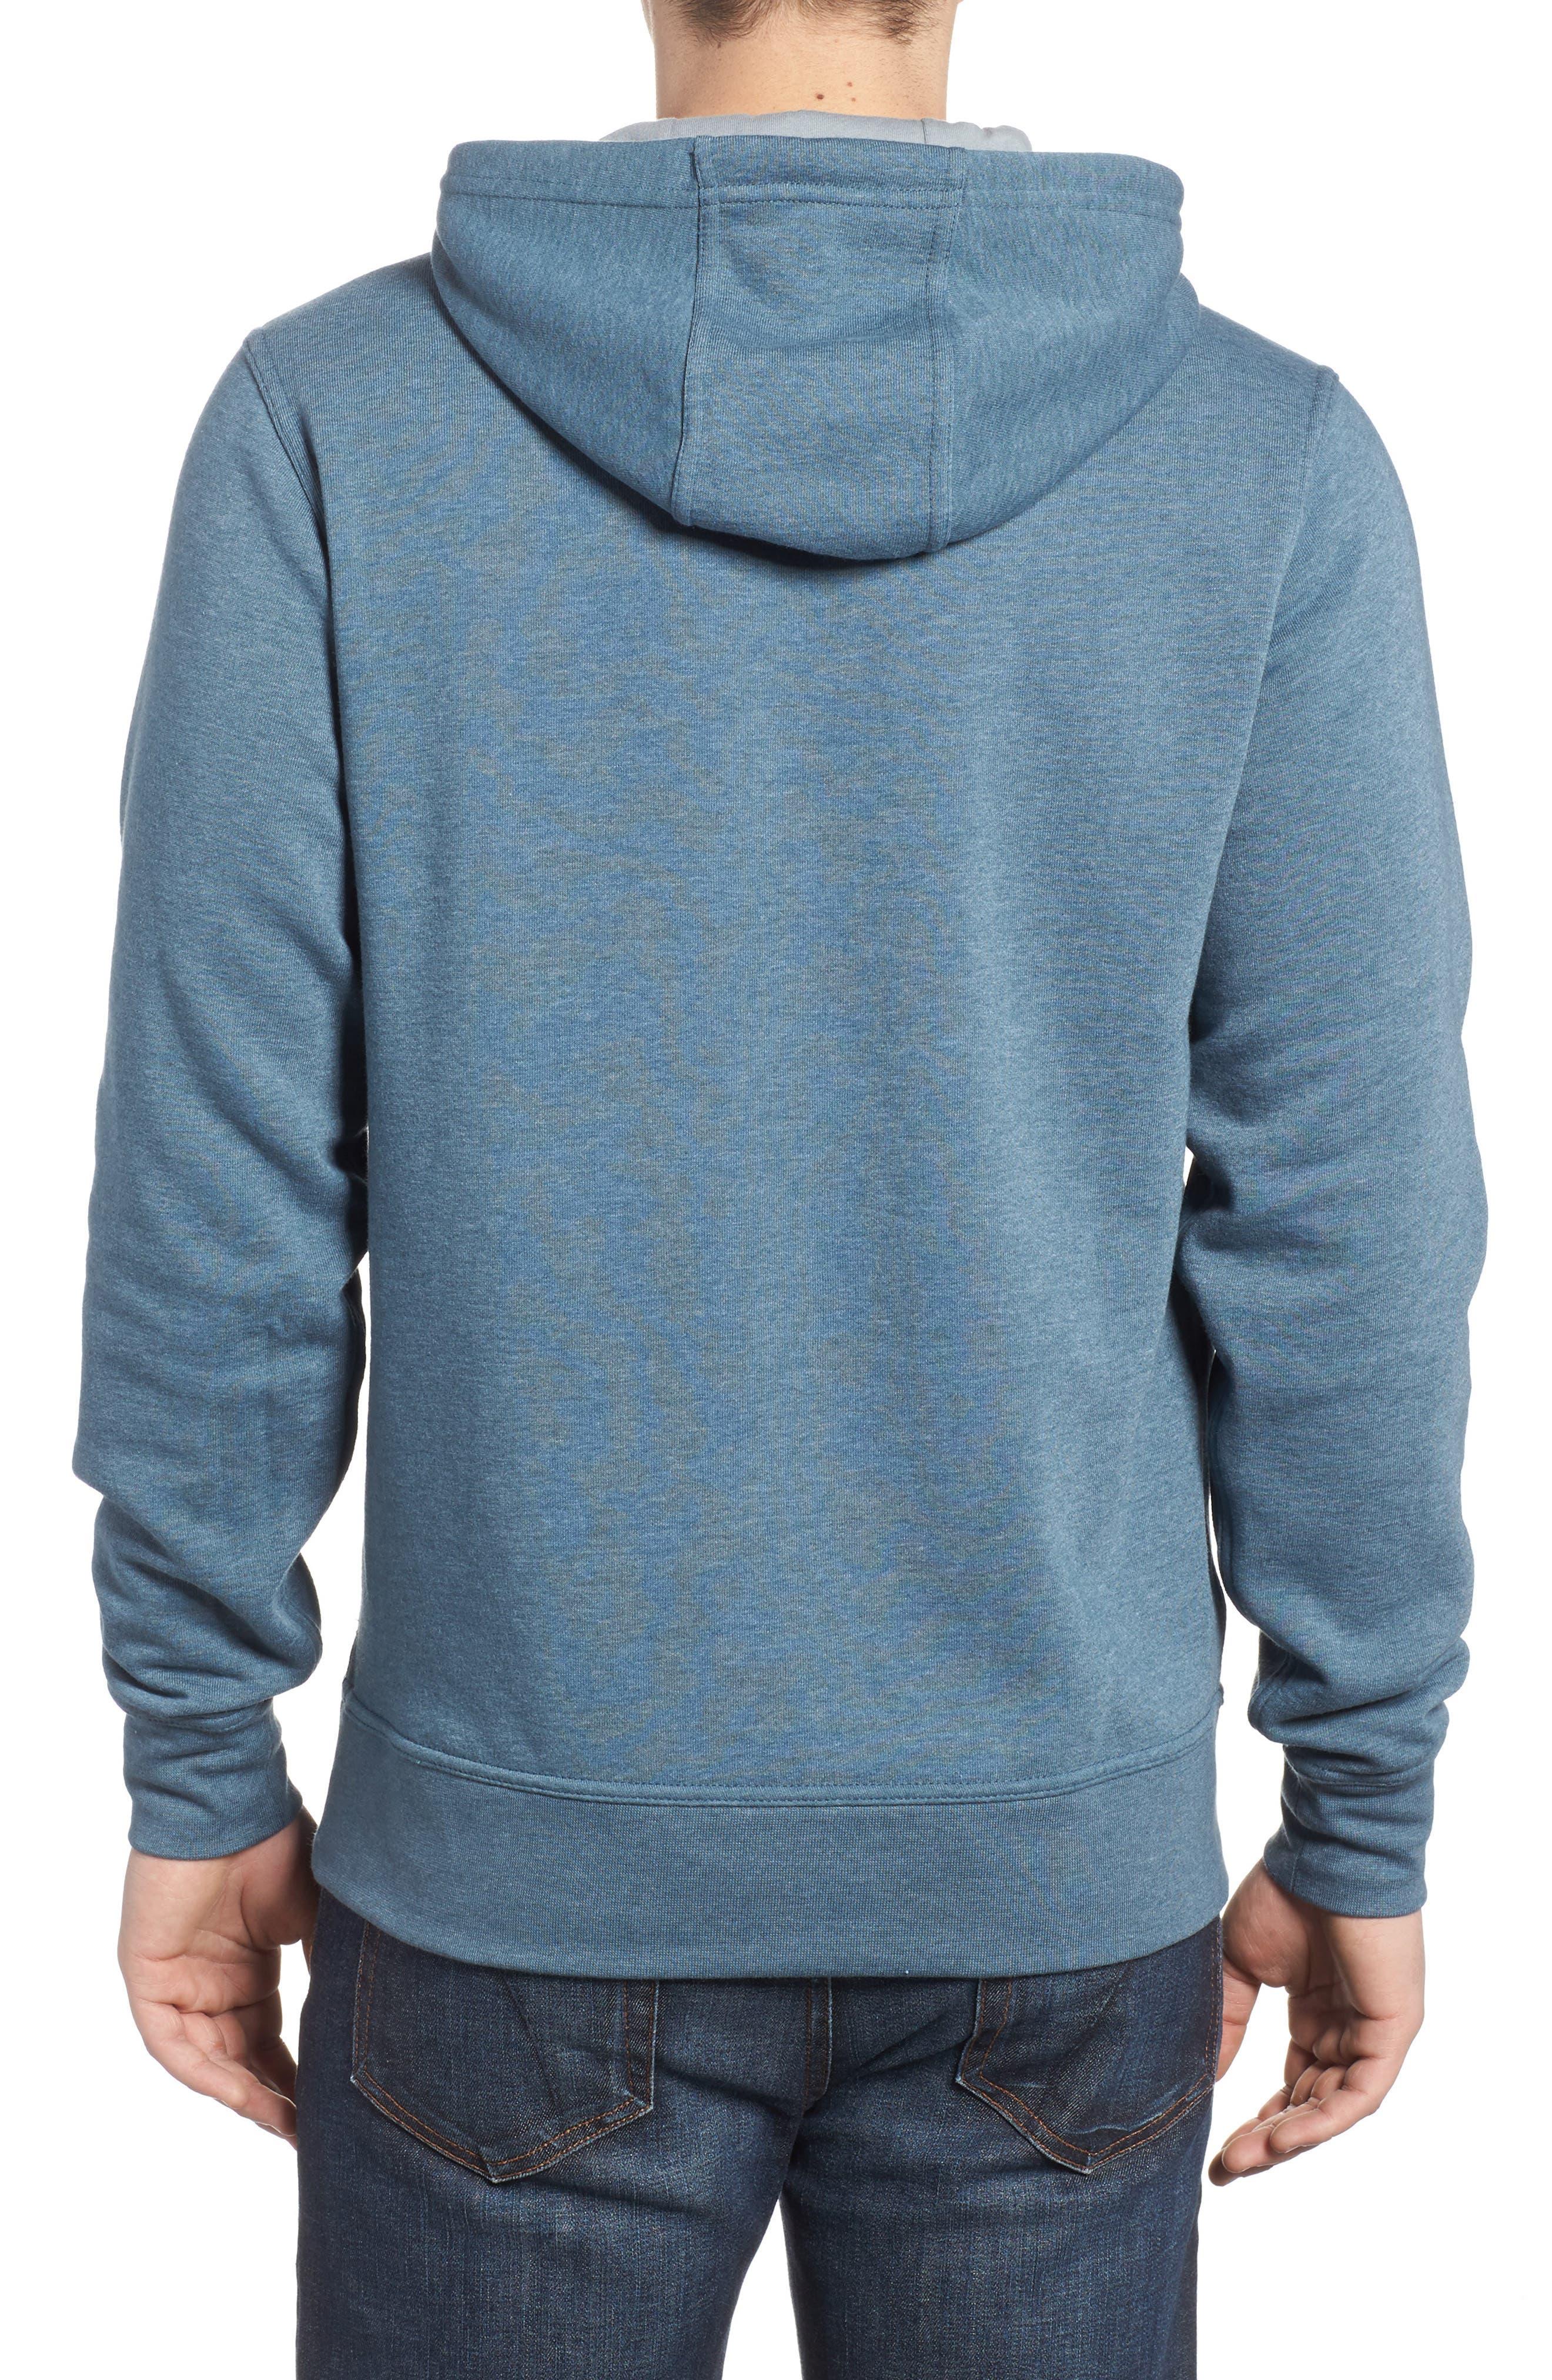 Half Dome Cotton Blend Hoodie,                             Alternate thumbnail 2, color,                             Conquer Blue / Monument Grey